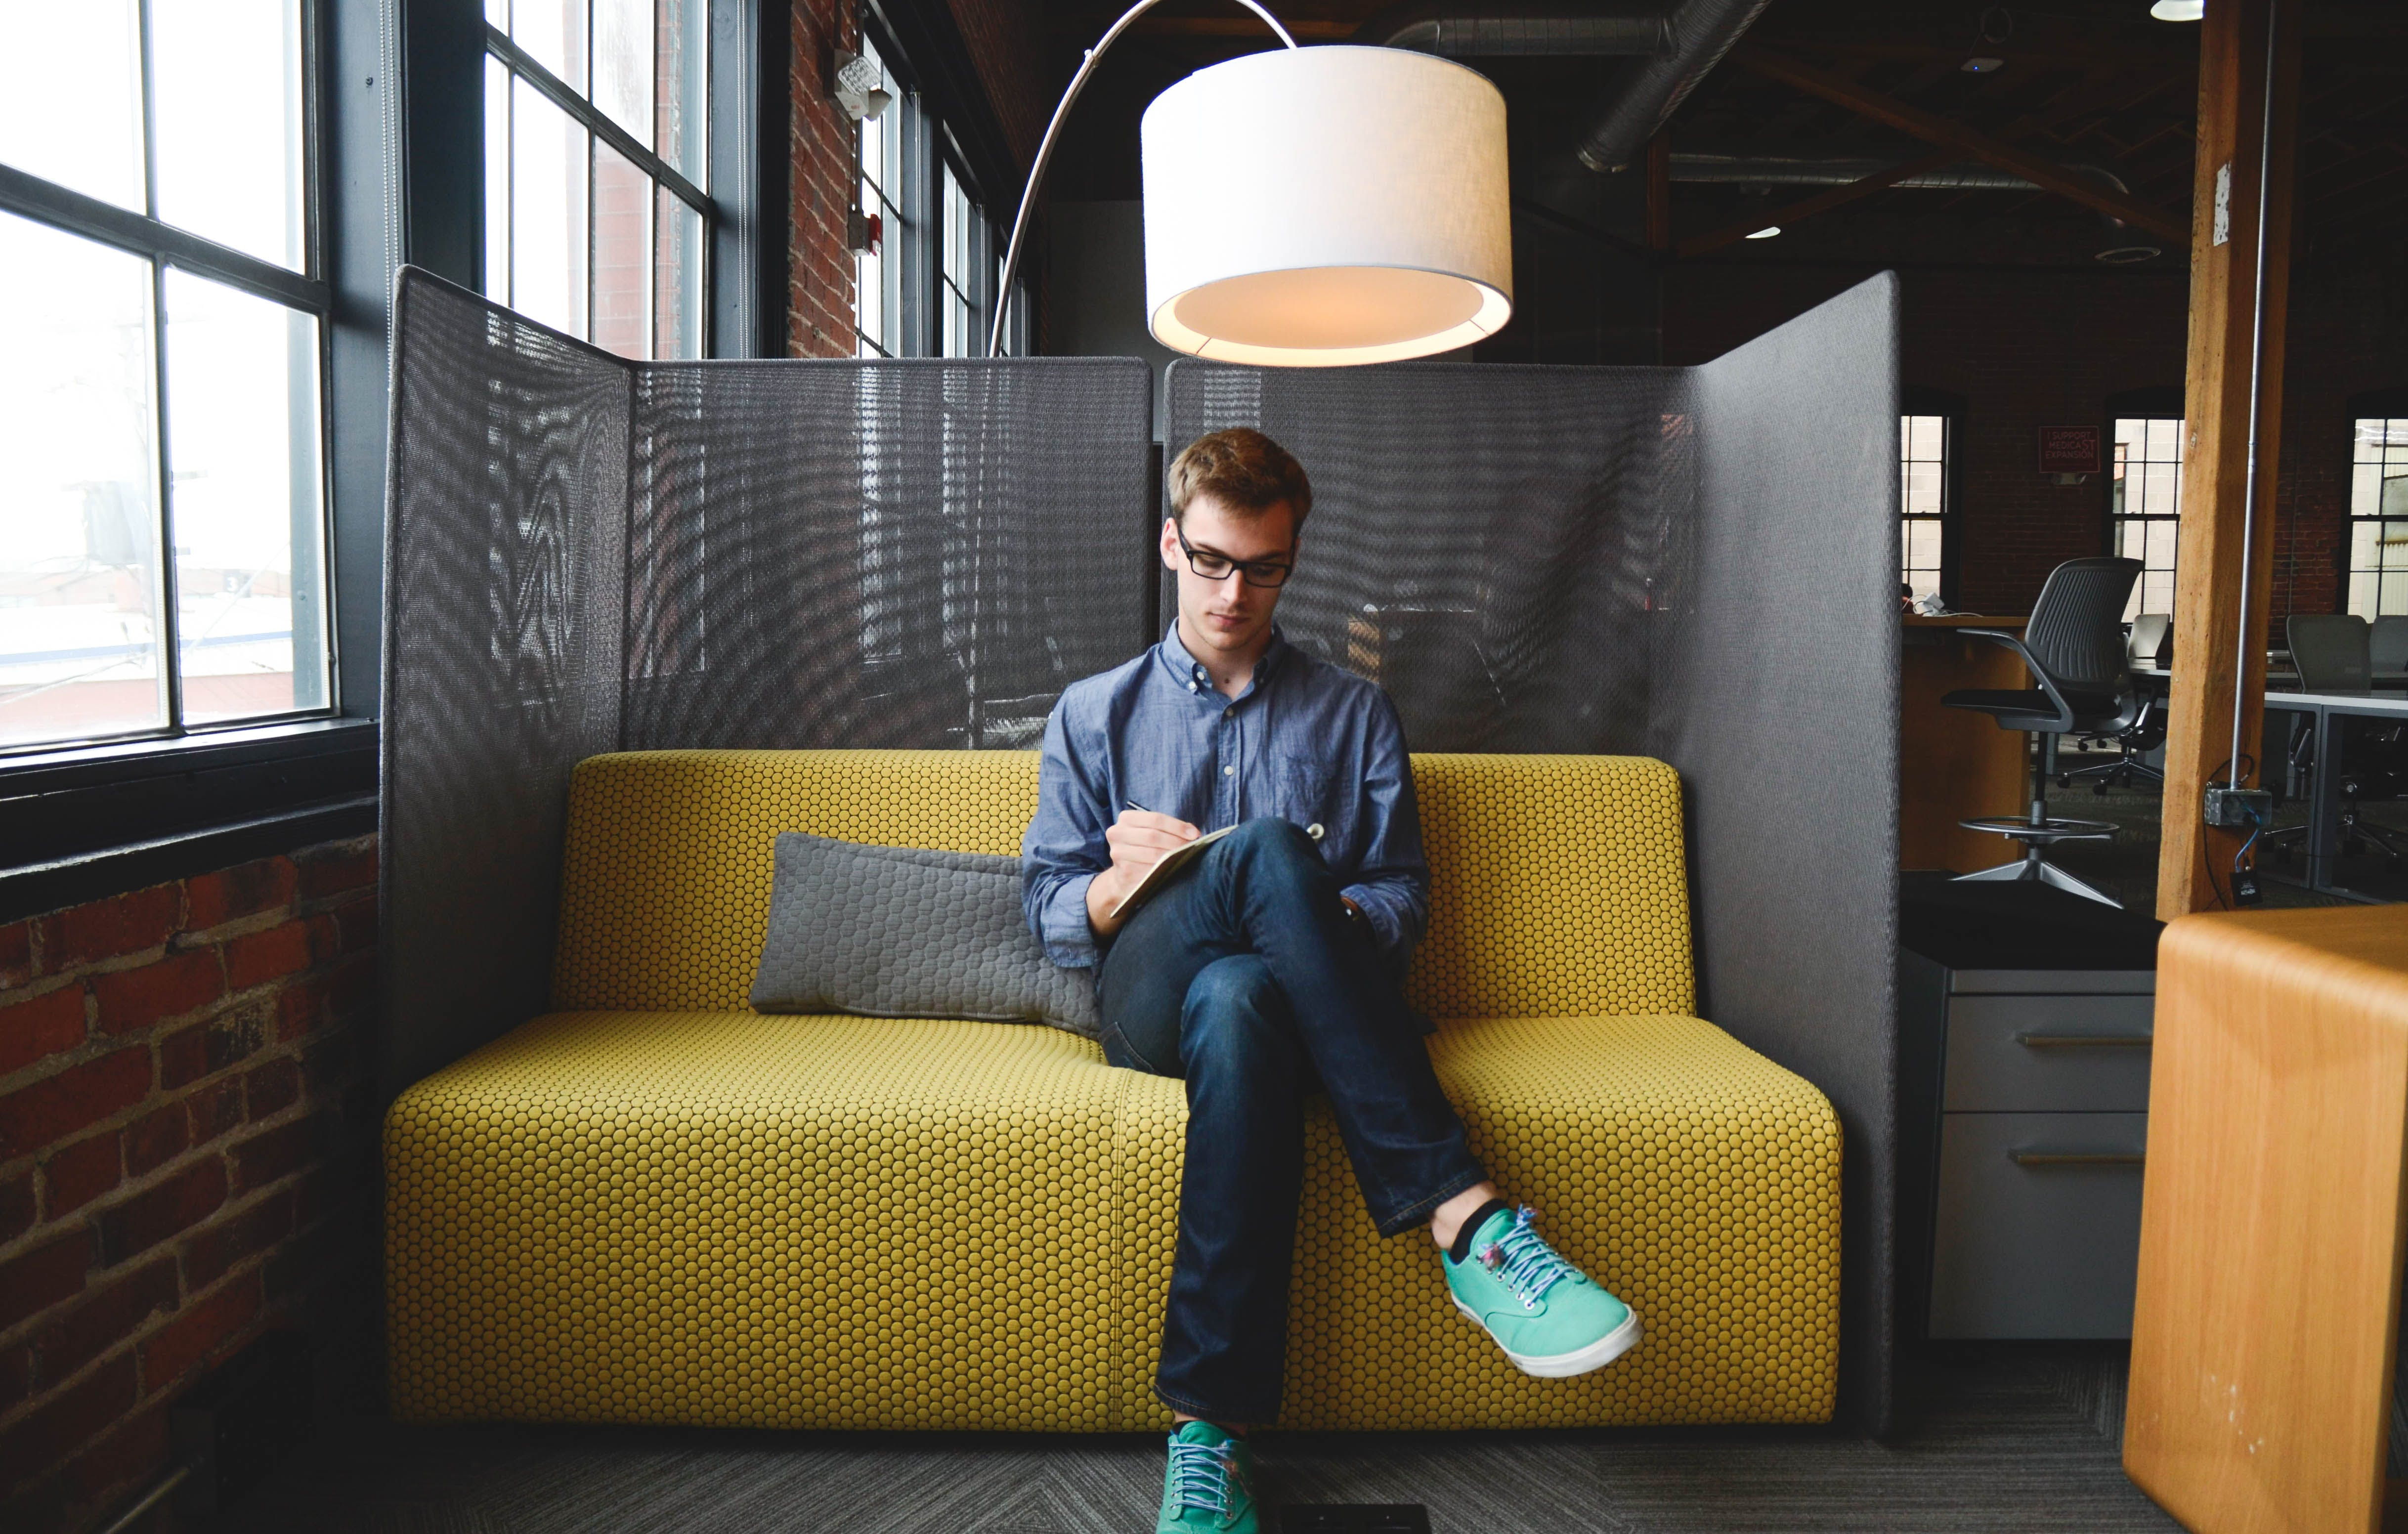 Man Wearing Blue Dress Shirt Sitting on Yellow Sofa